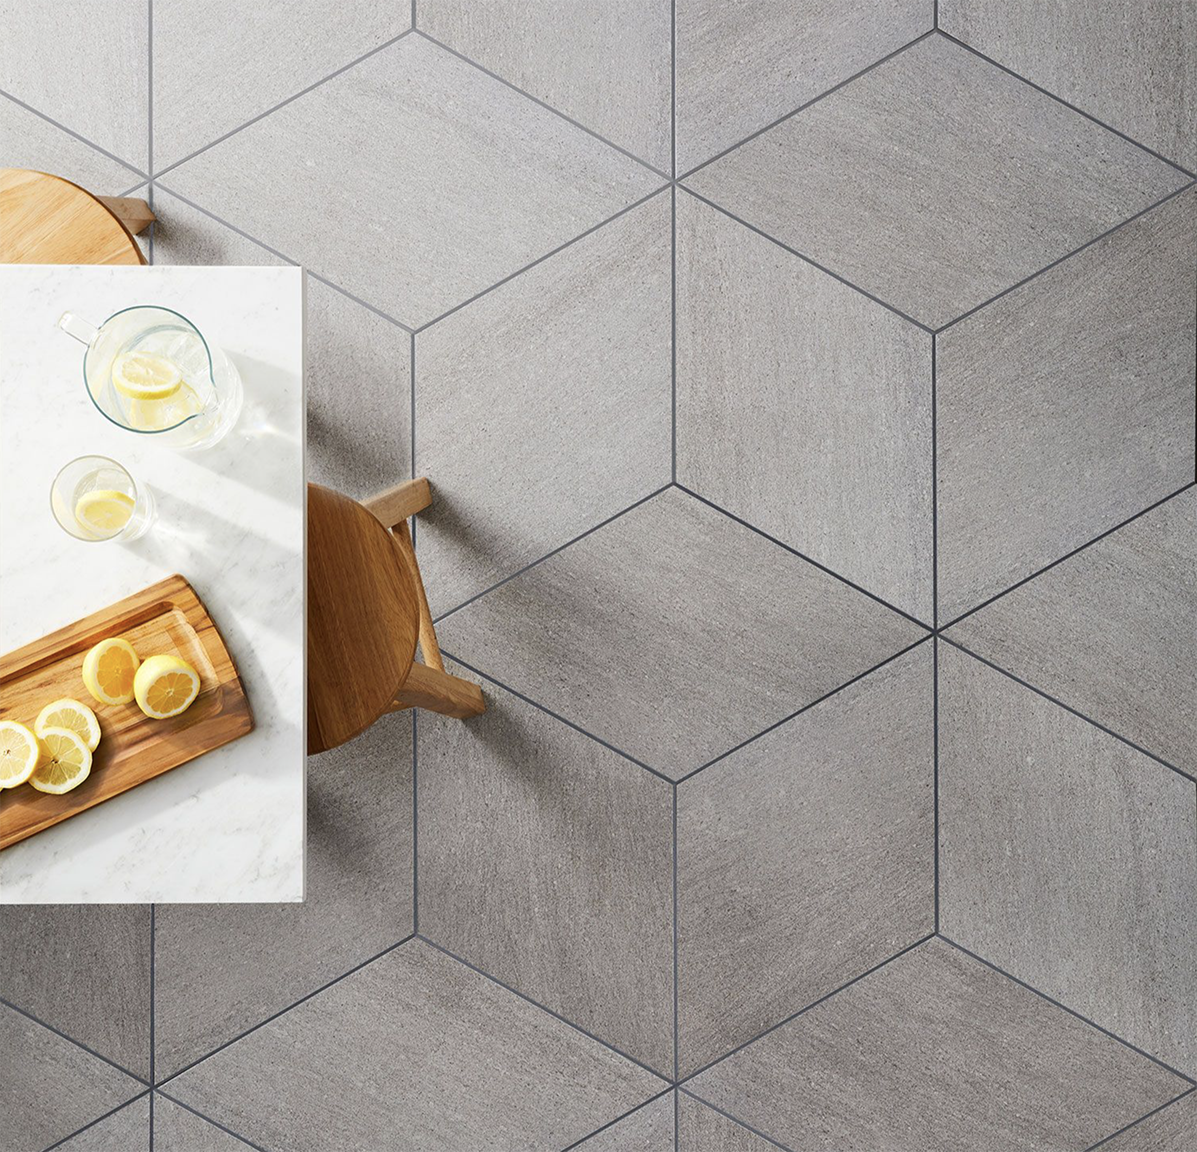 Diamond City Grey Porcelain Floor And Wall Tile 16 X 28 In Flooring Porcelain Flooring Diamond Tile Floor